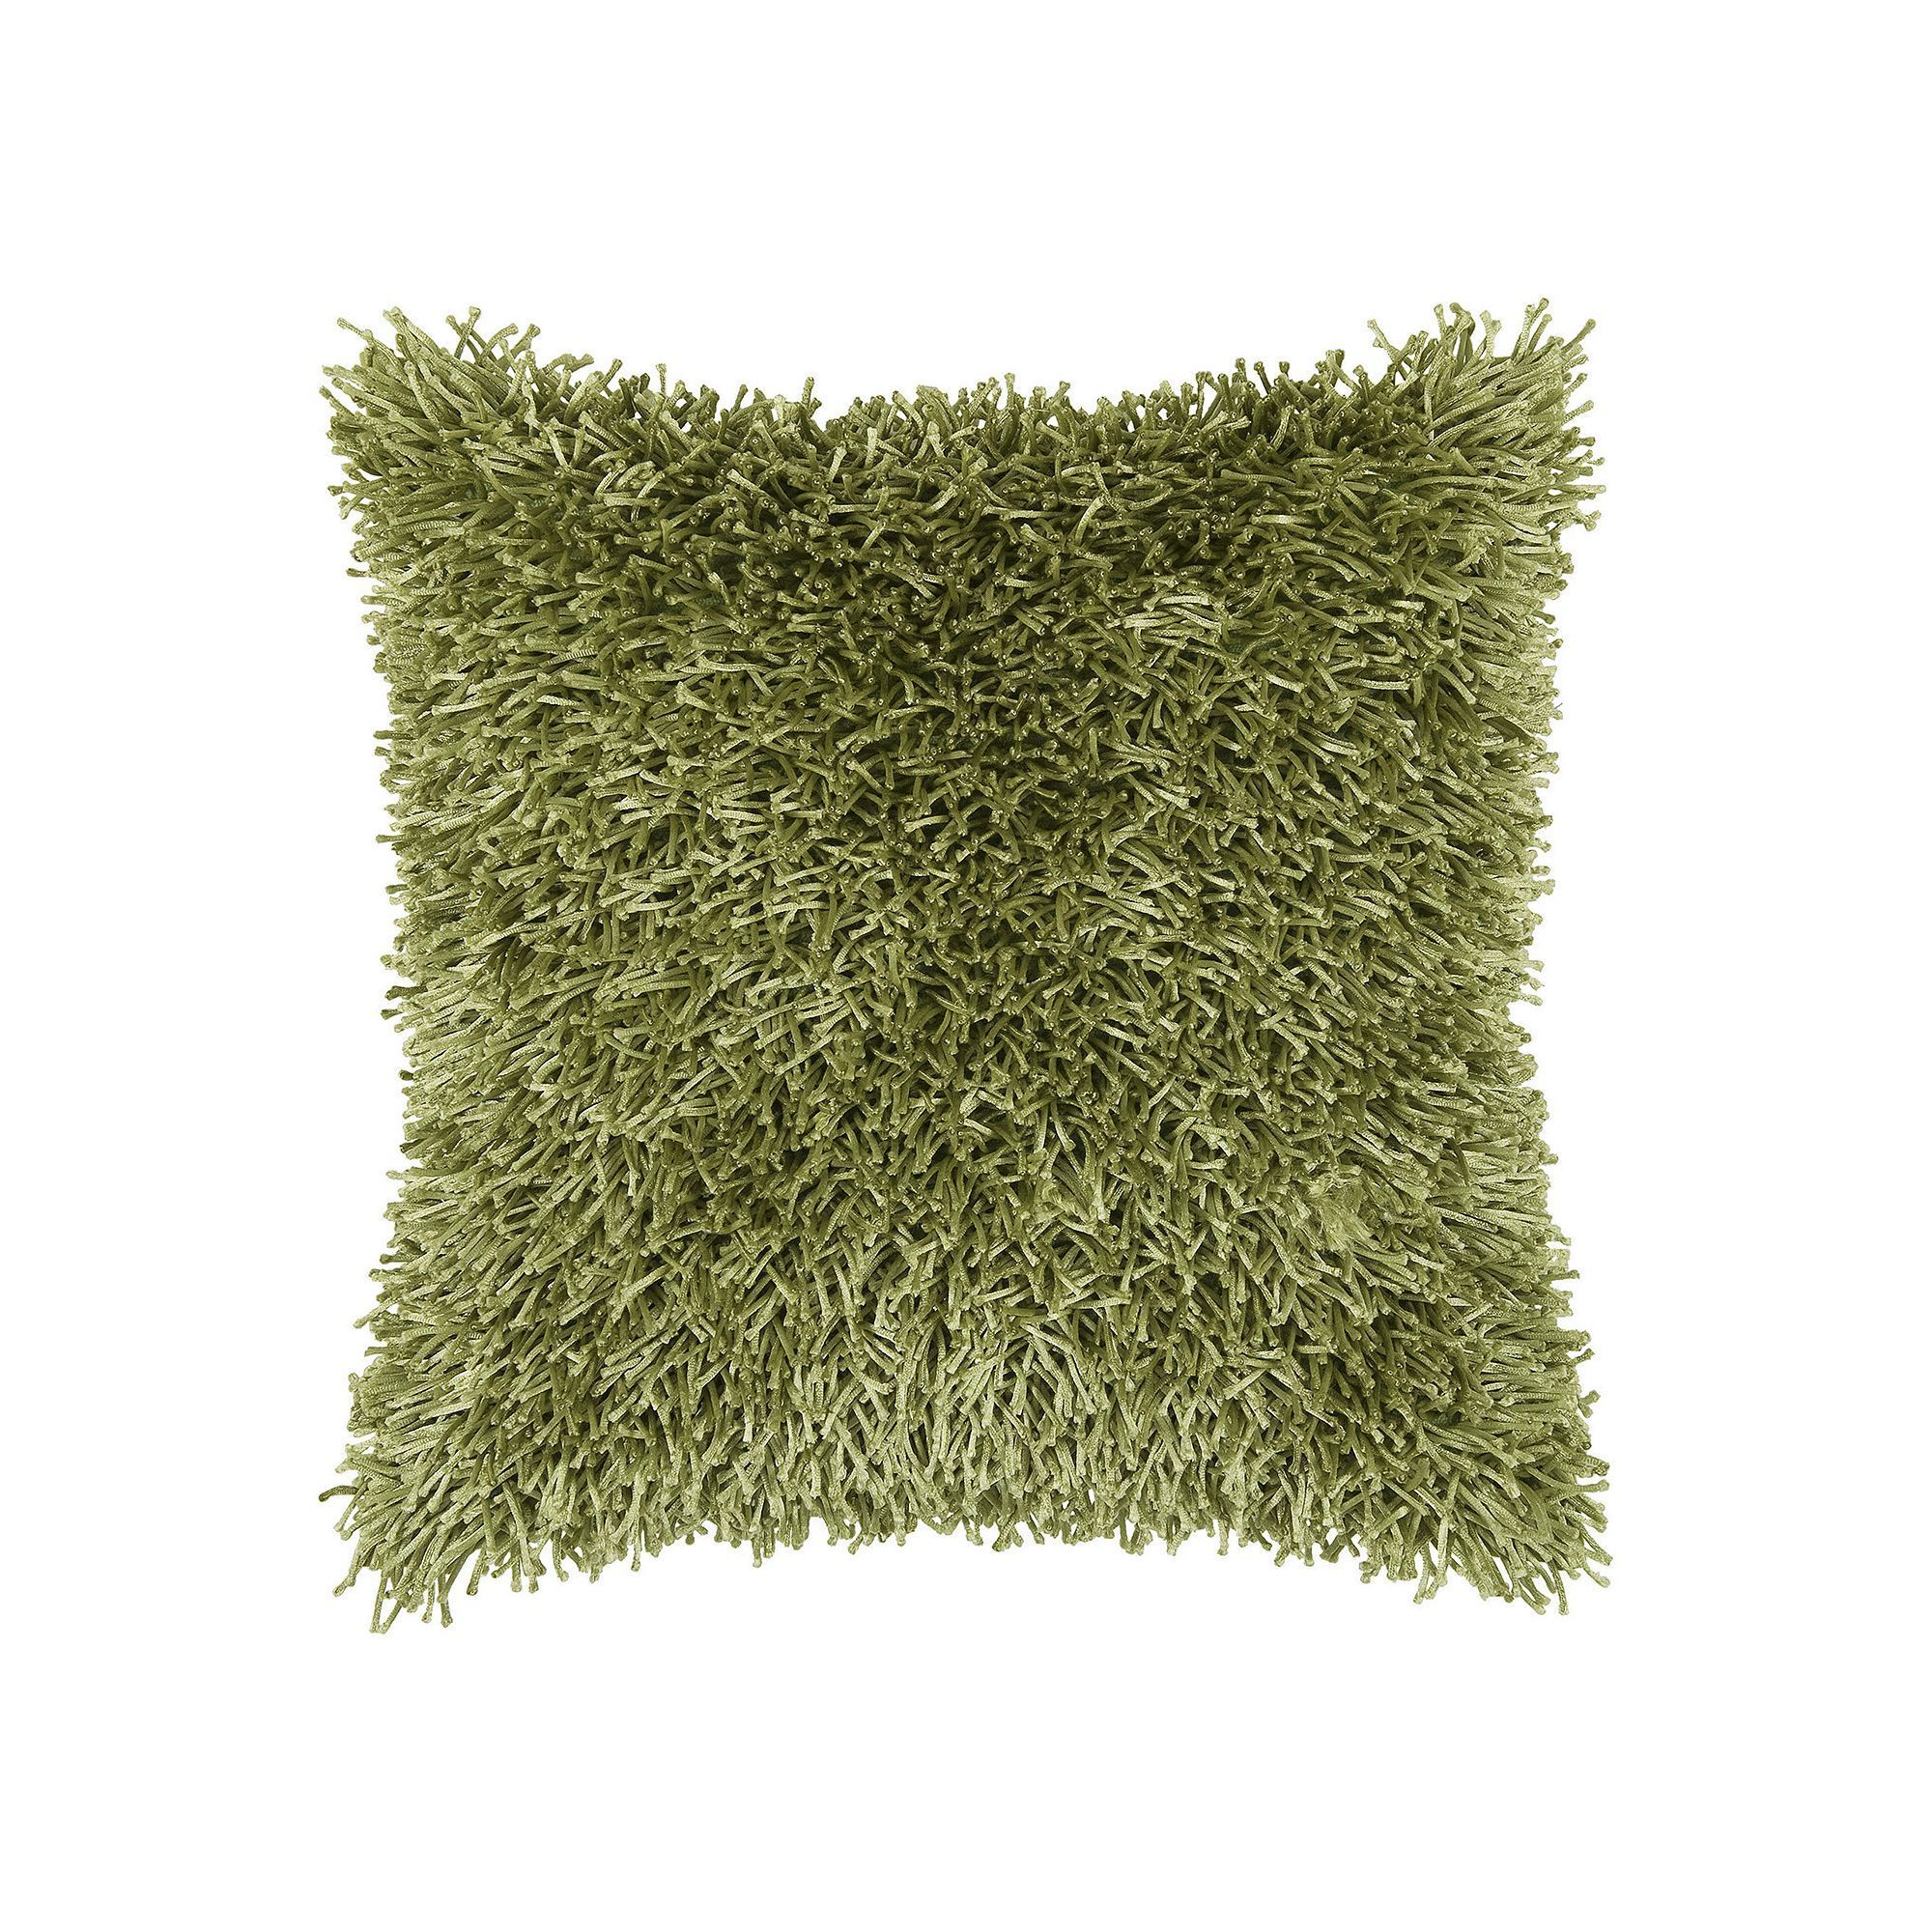 Rizzy home modern shag throw pillow throw pillows pillows and